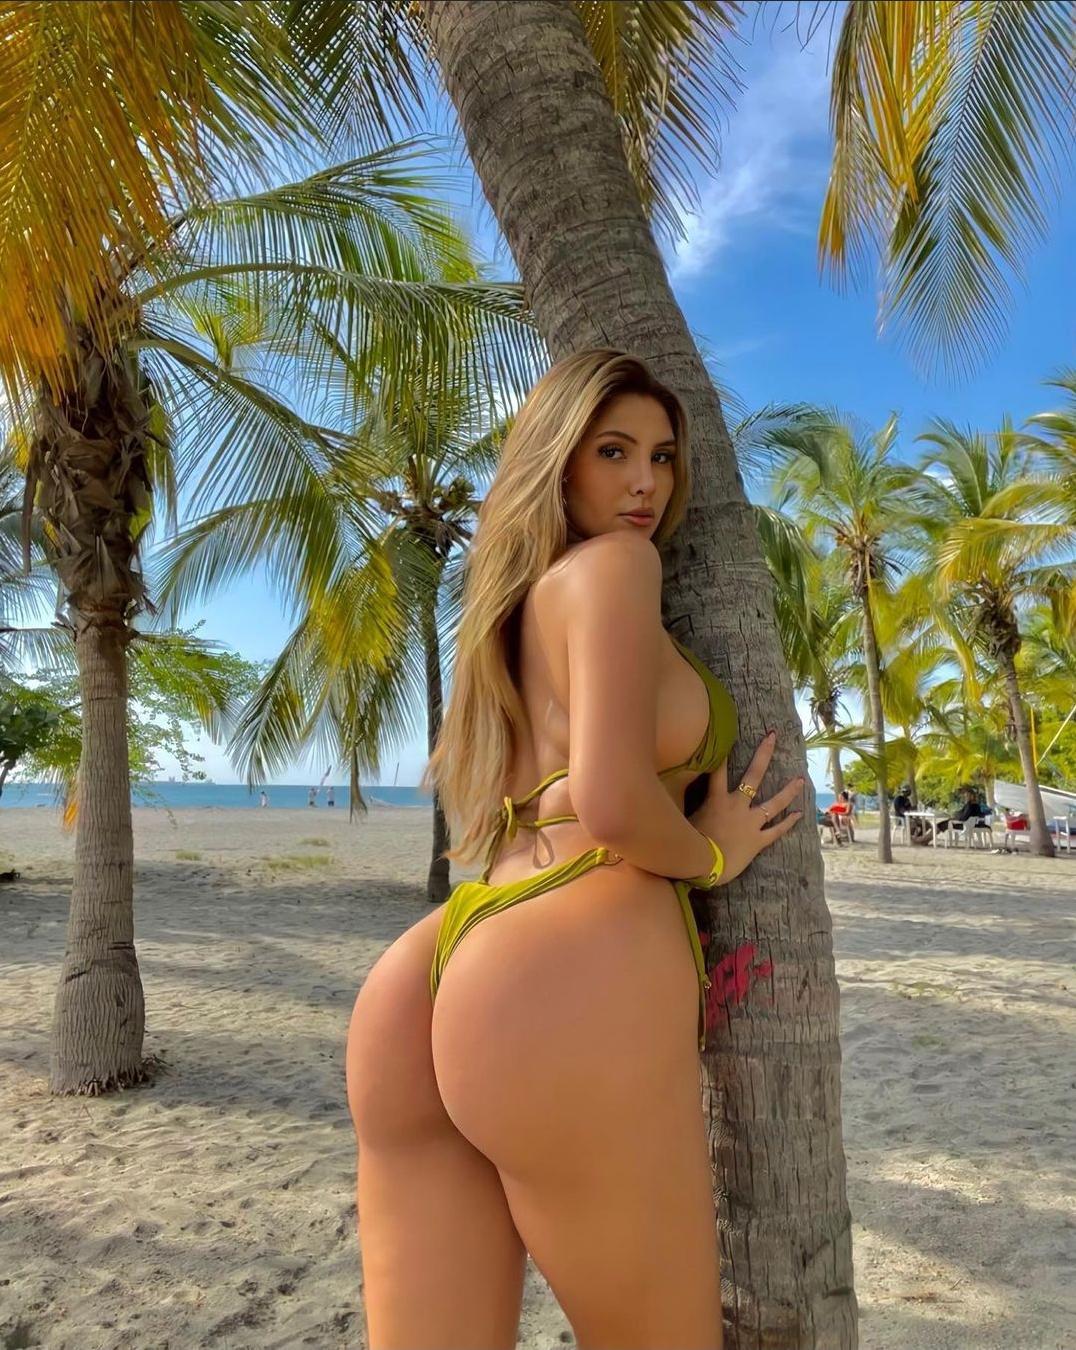 Nicol Ramirez